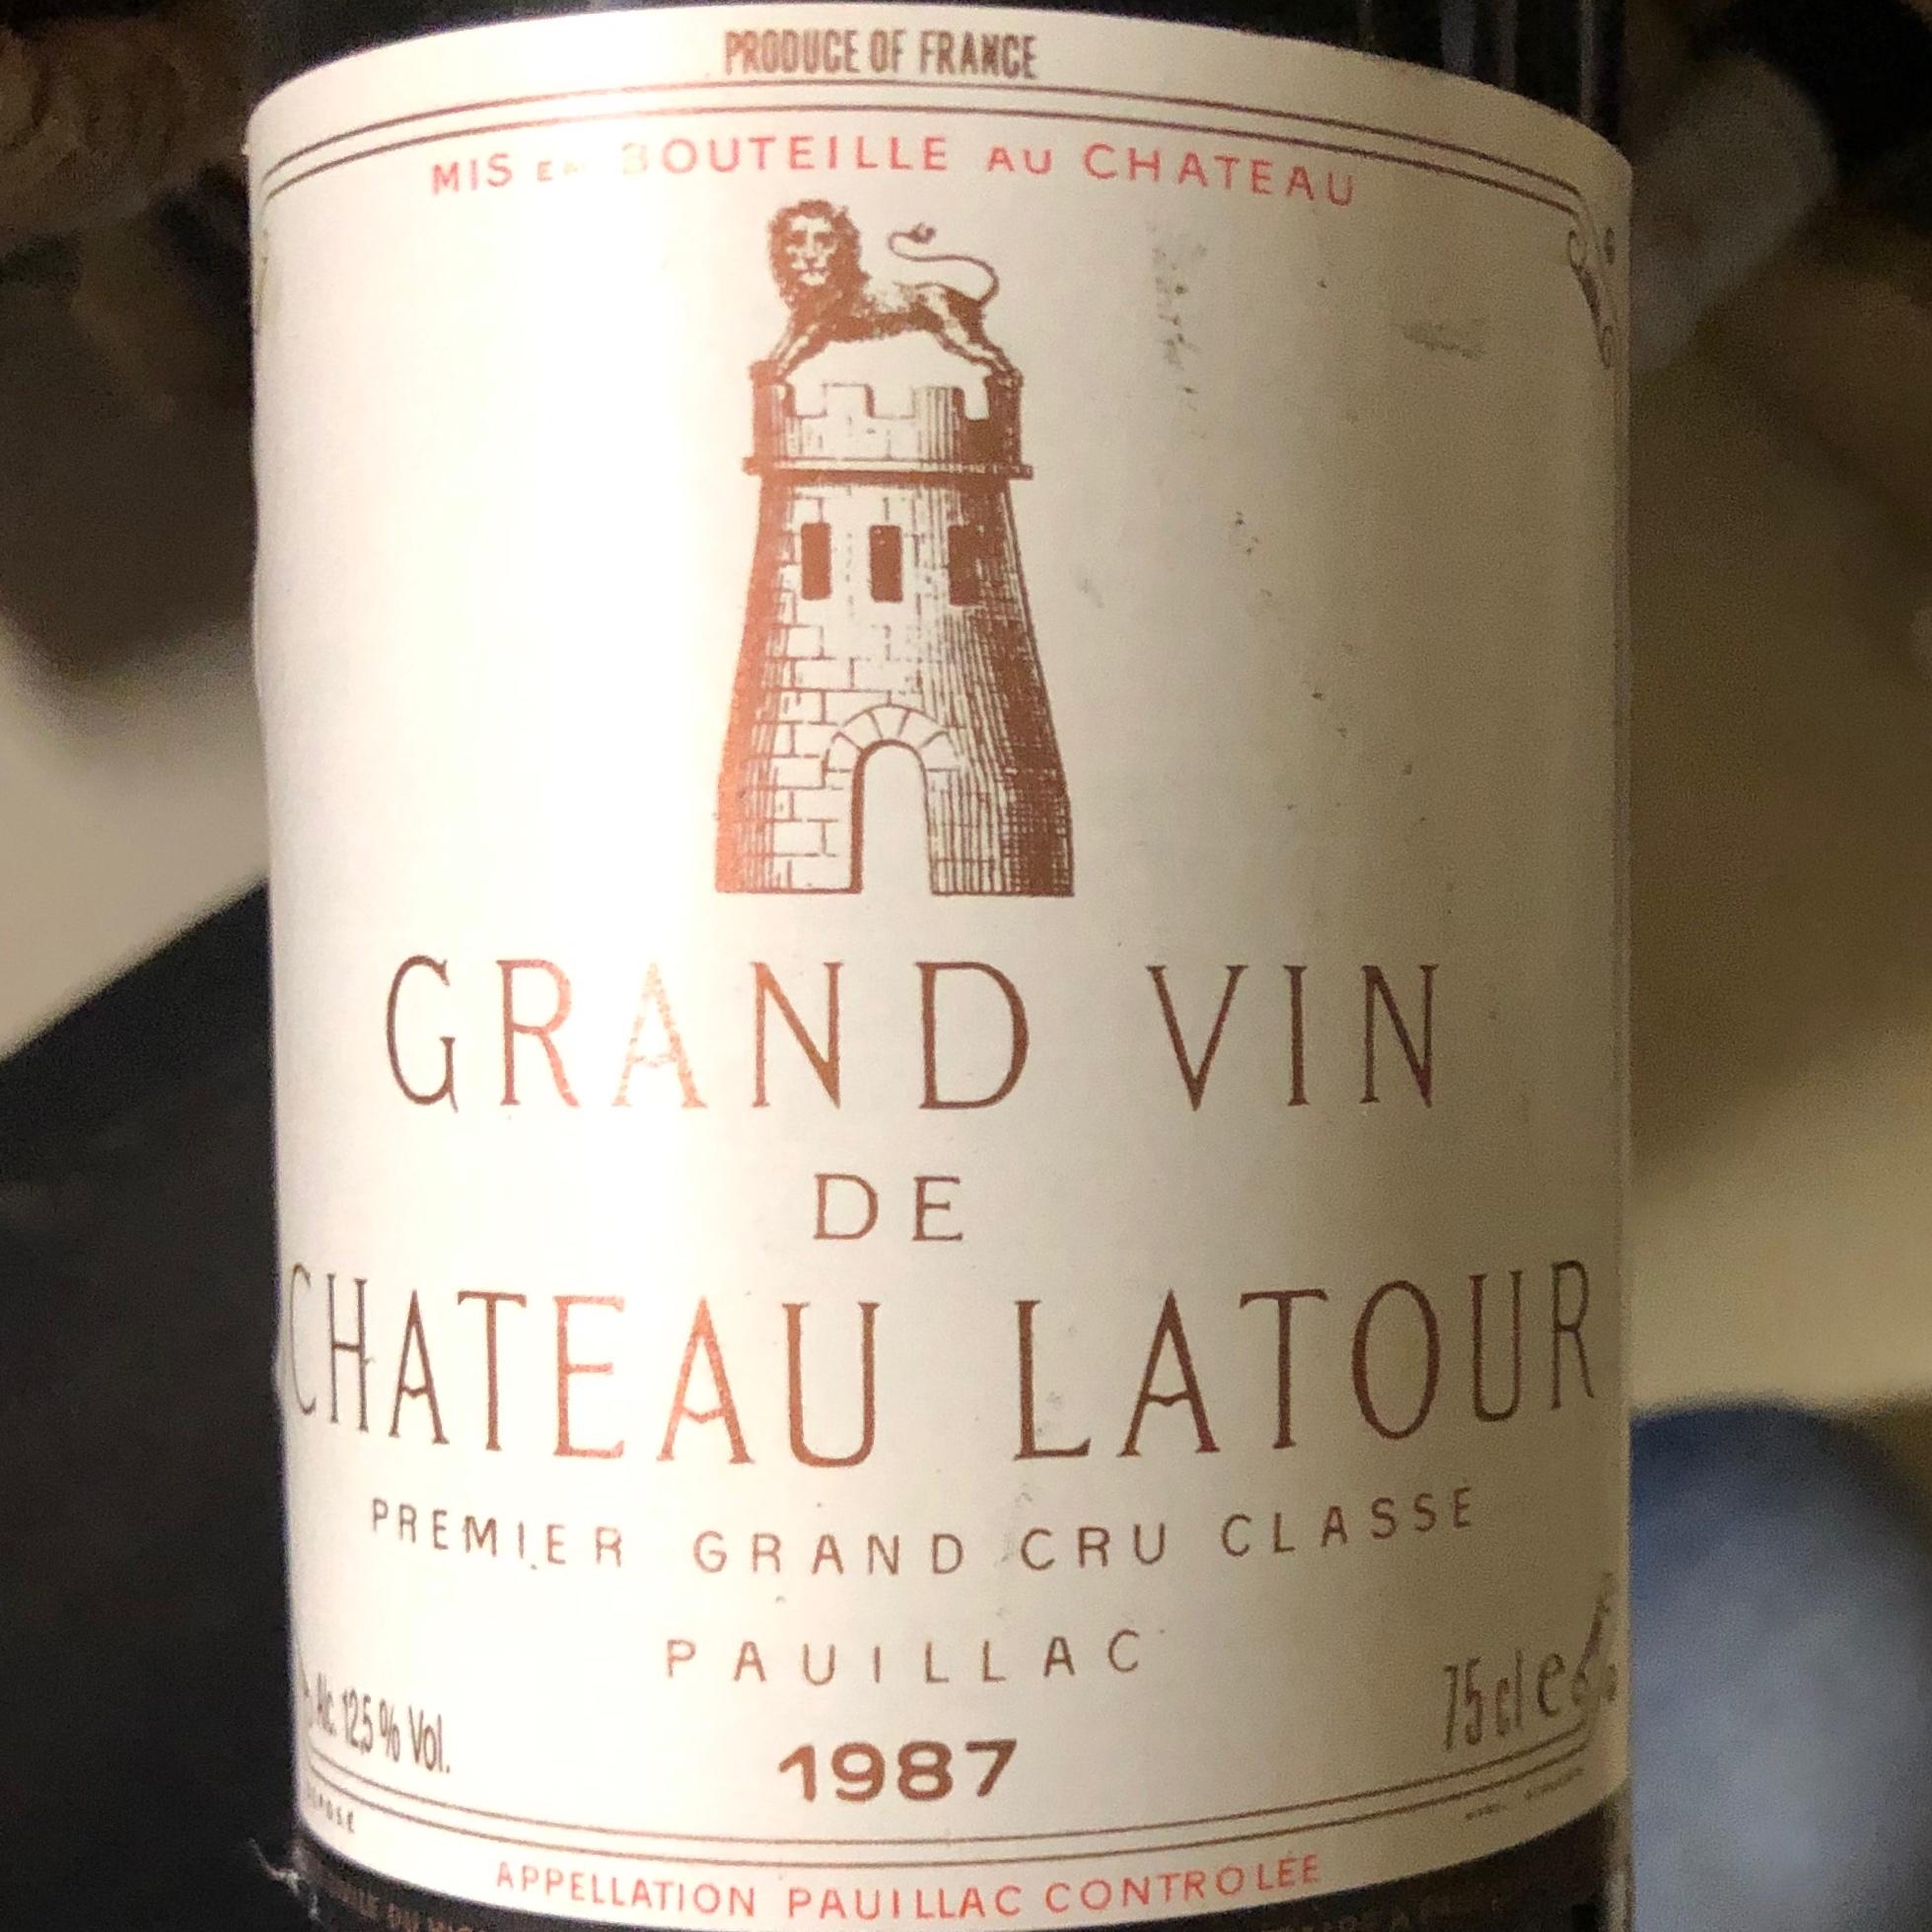 Chateau Latour, Jahrg. 1987